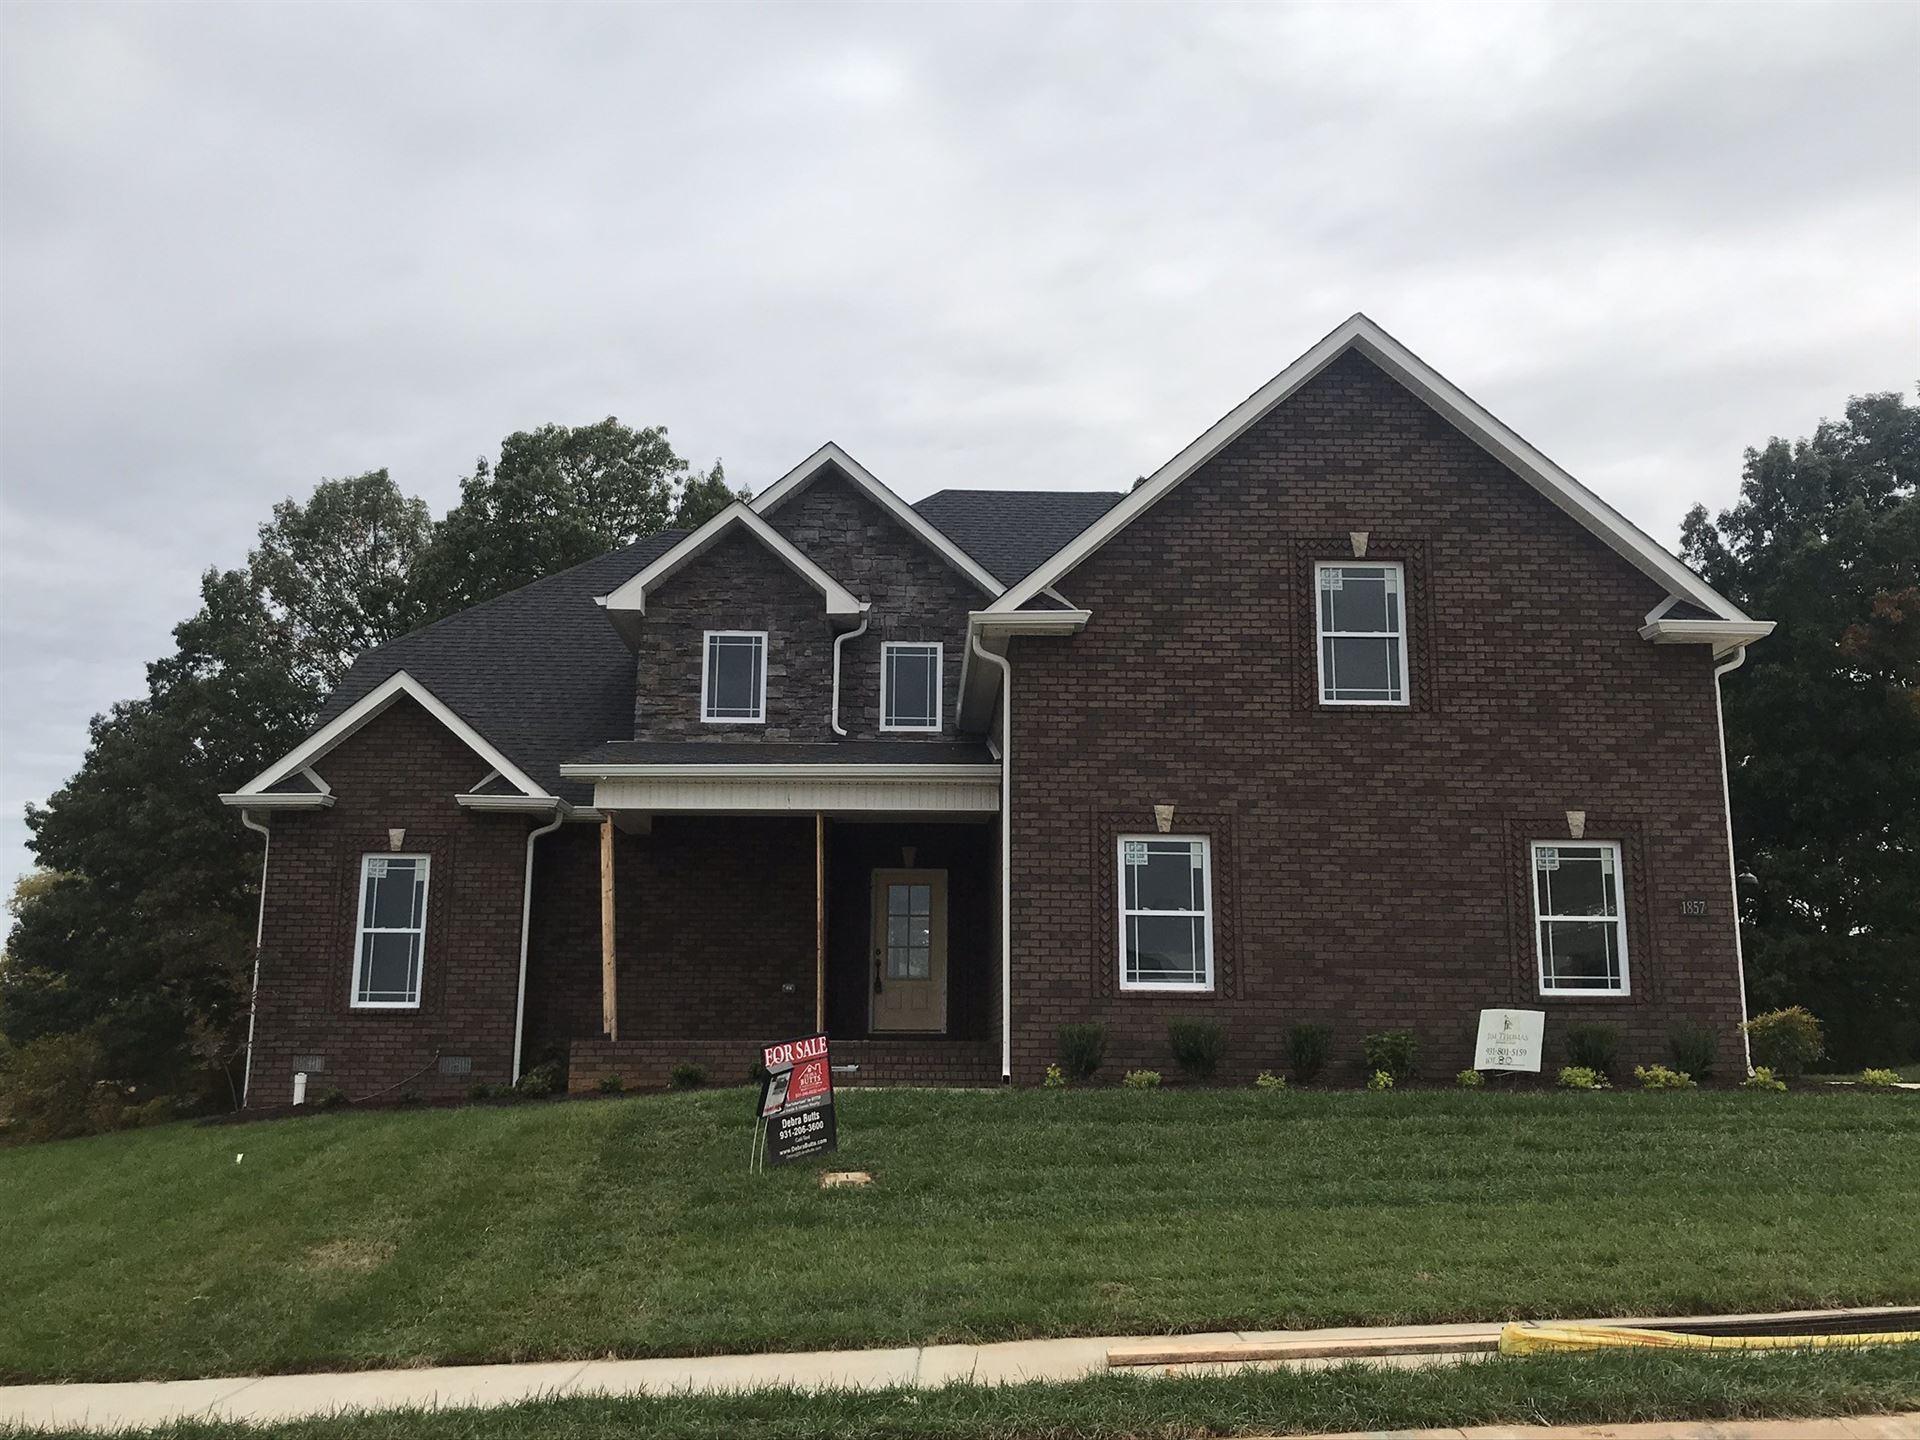 80 Hartley Hills, Clarksville, TN 37043 - MLS#: 2165716